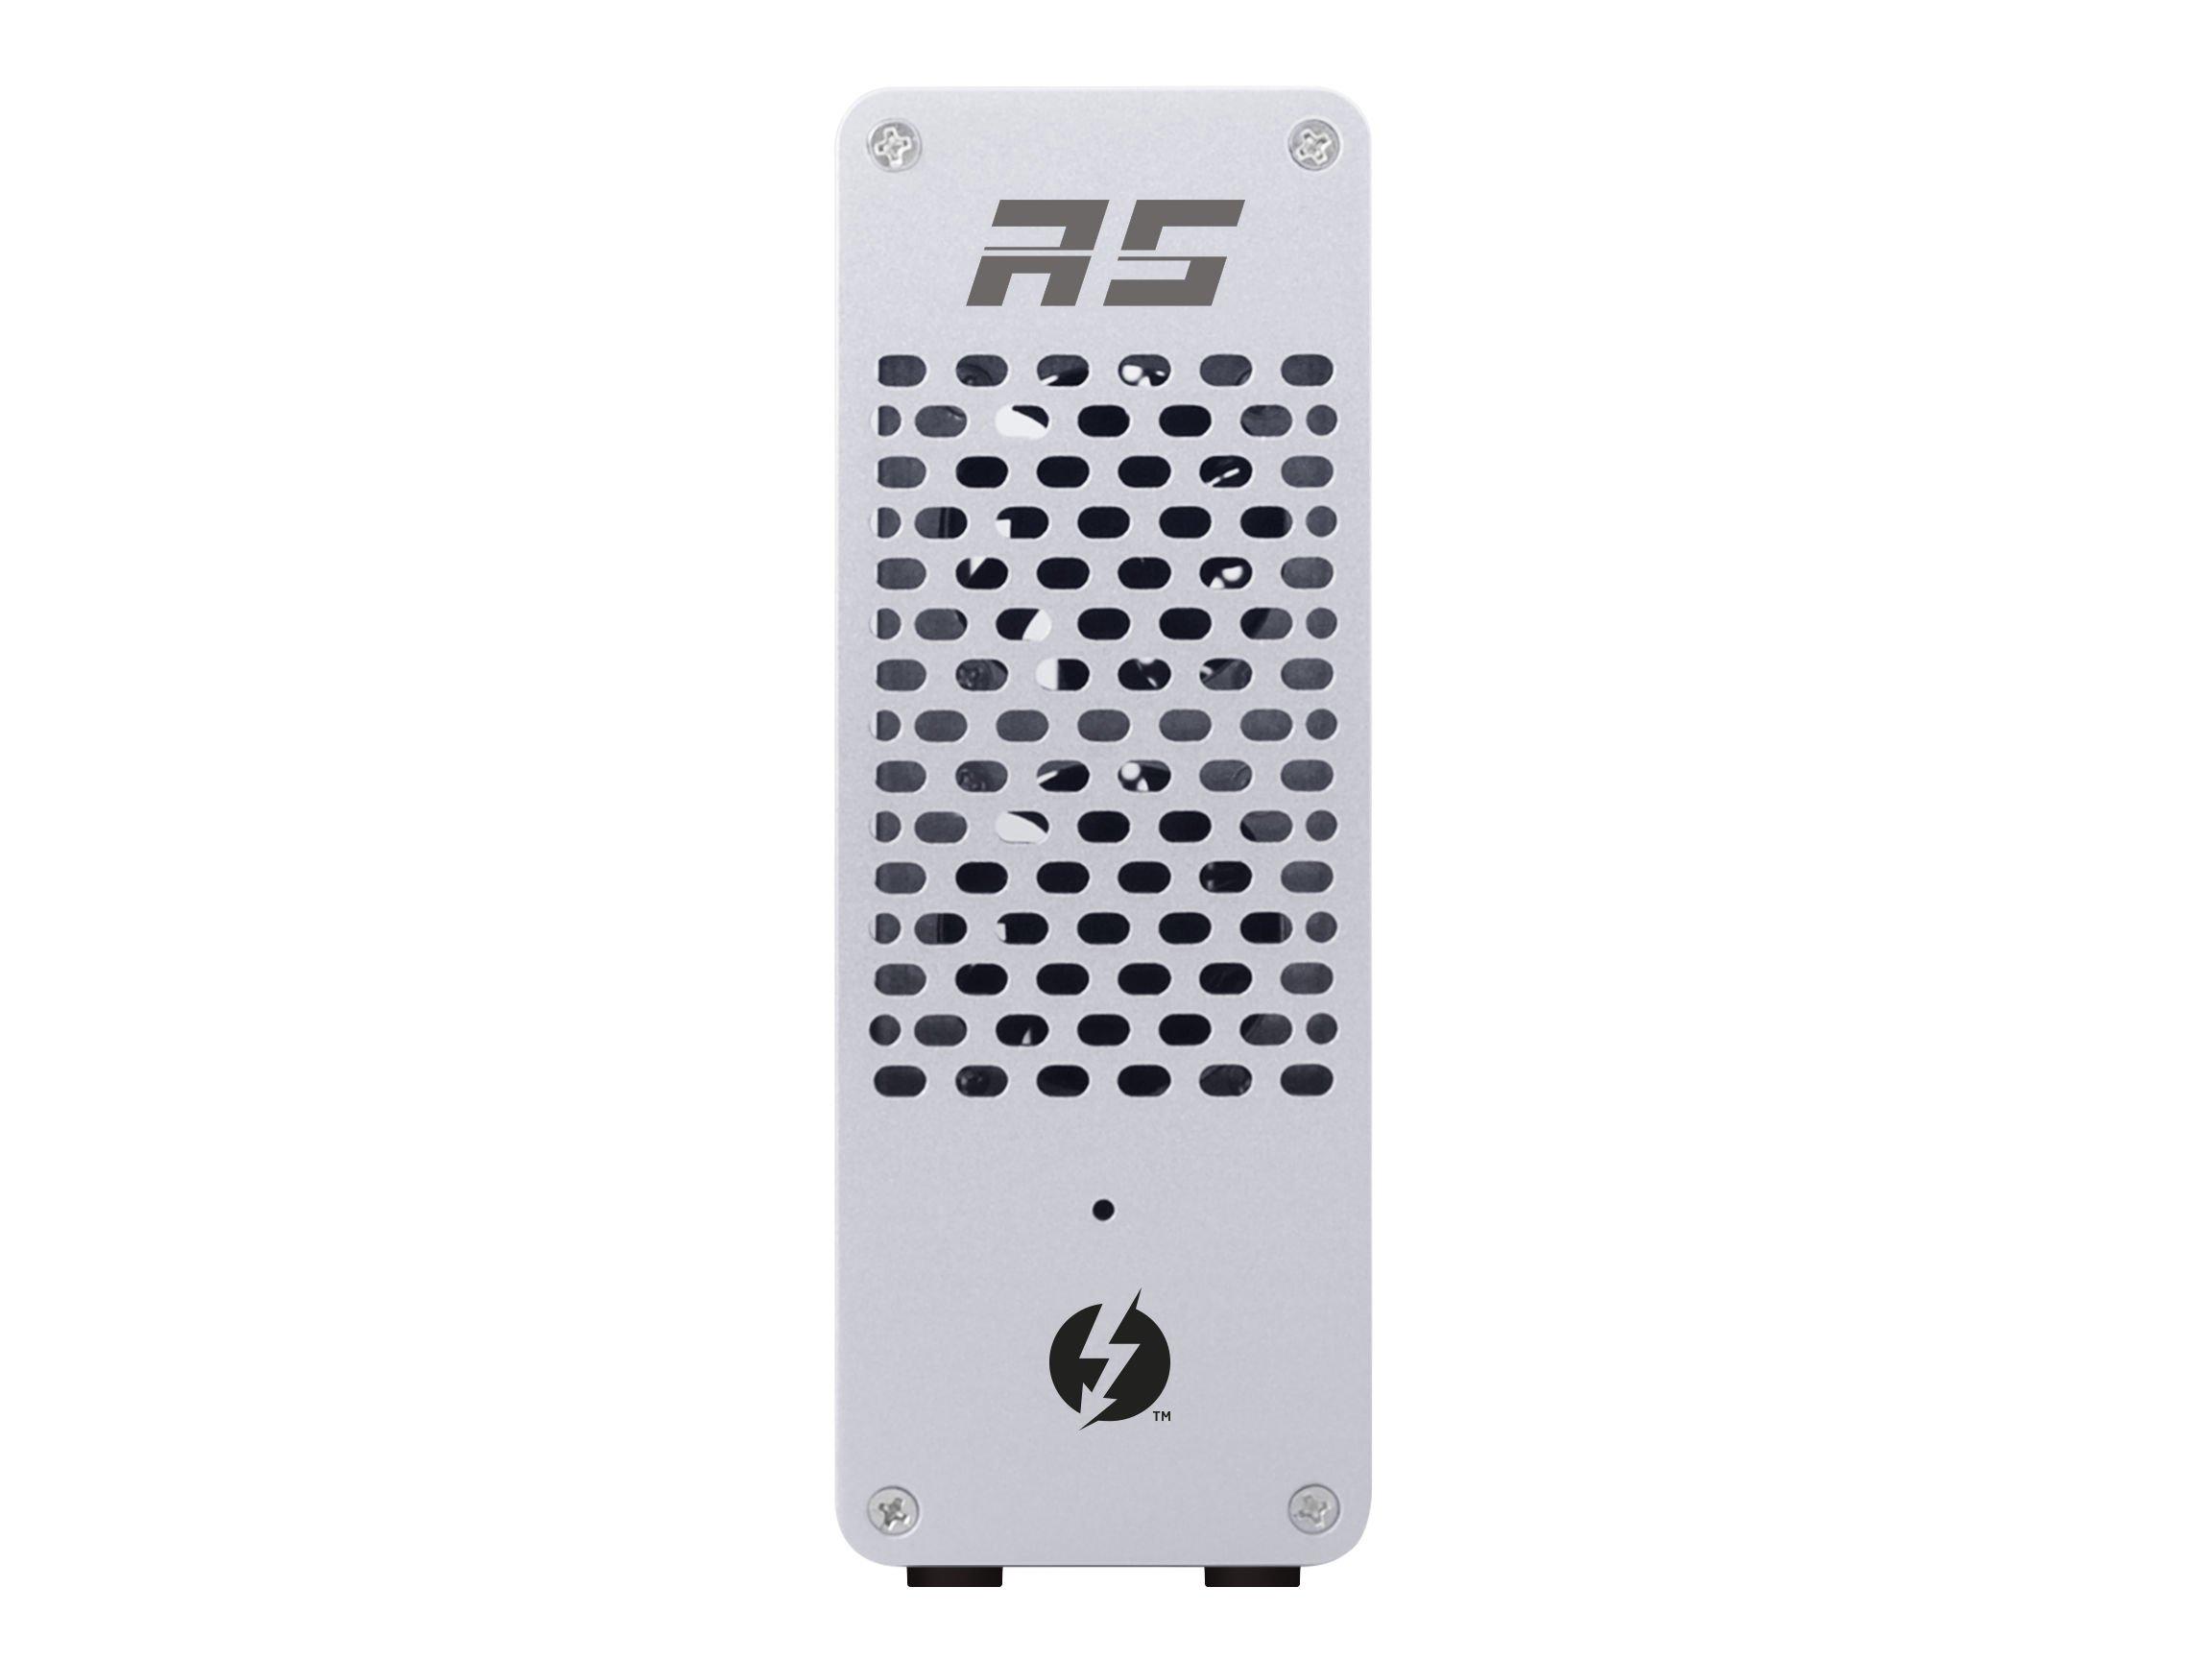 Highpoint RocketStor 6661A-4USB Thunderbolt 3 to 4X 10Gb/s USB 3.1 Adapter